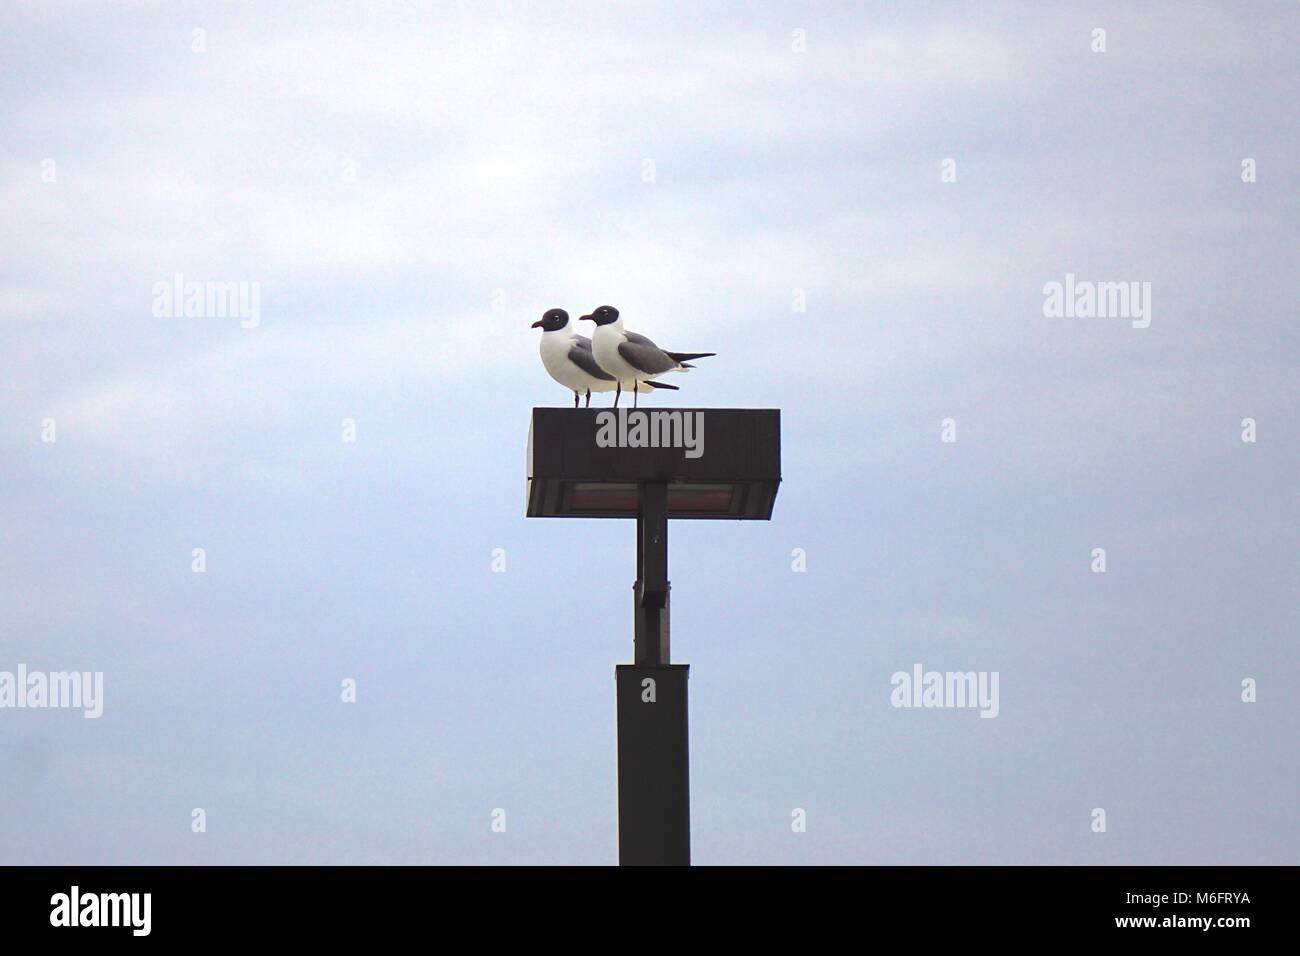 A pair of laughing gulls (Leucophaeus atricilla) on an outdoor light fixture. - Stock Image